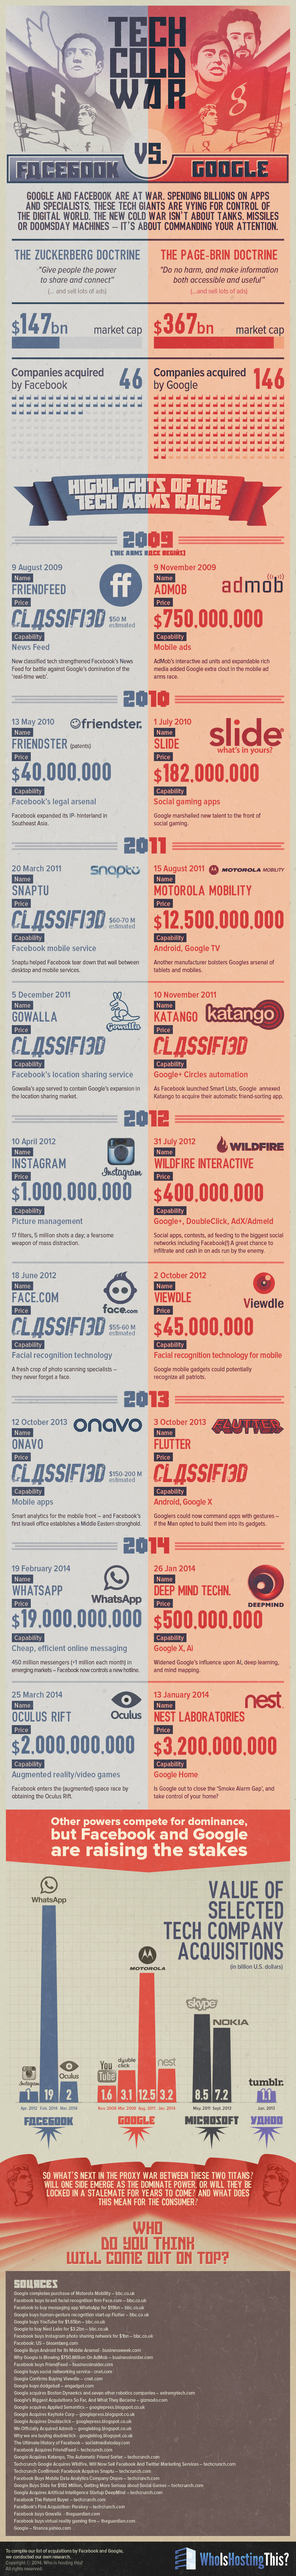 Facebook gegen Google: Kalter Krieg der IT-Giganten